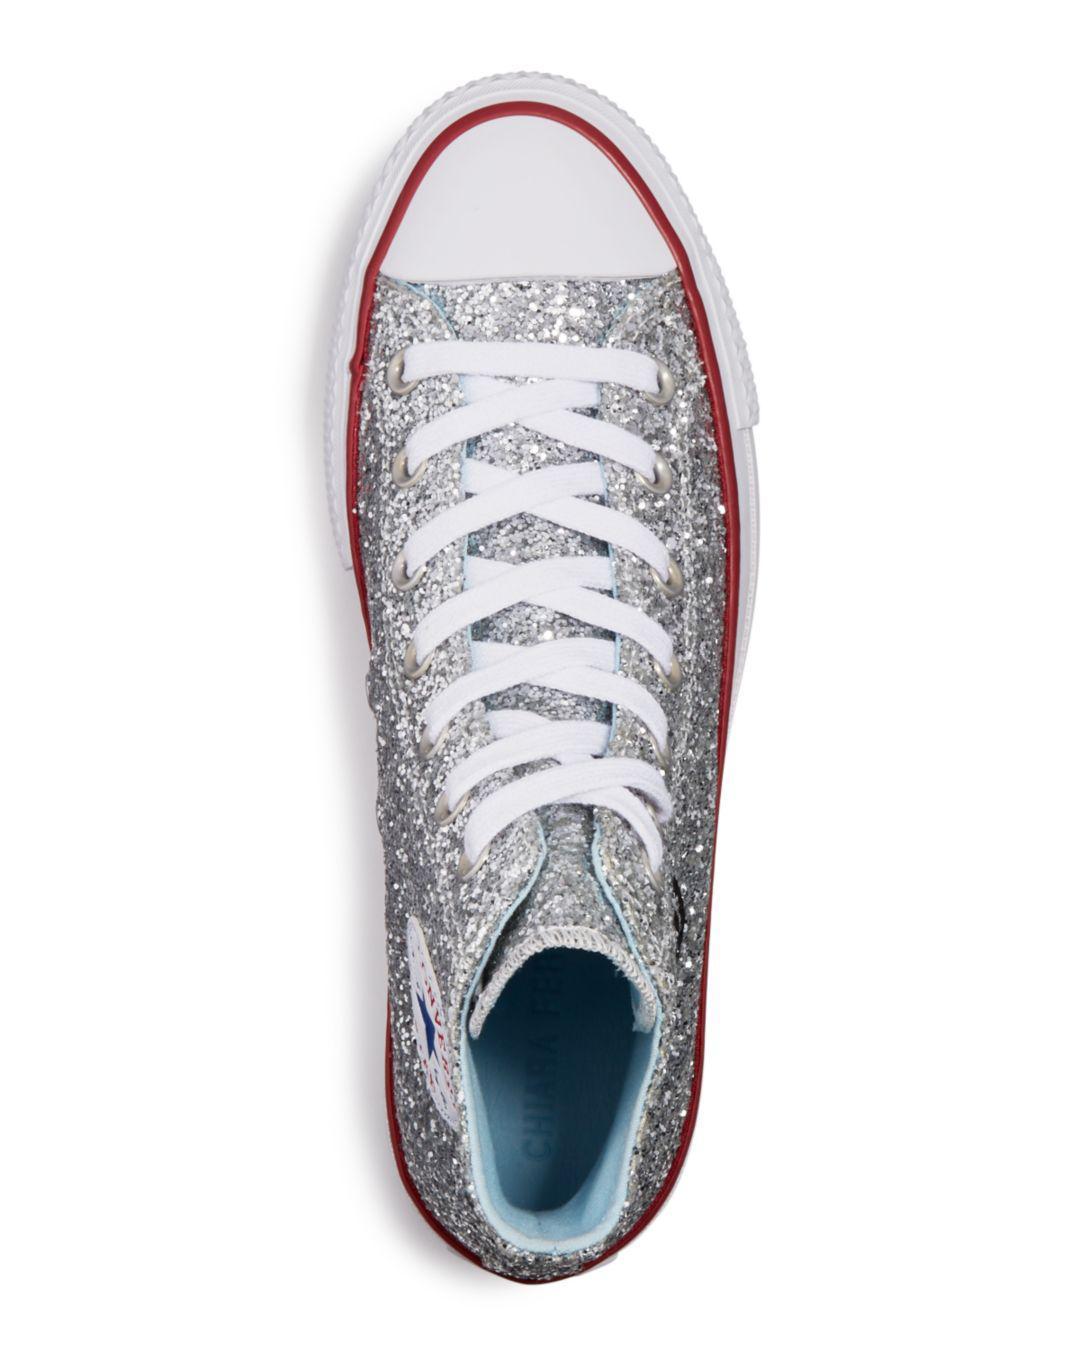 f81495c4f81 Lyst - Converse X Chiara Ferragni Women s Chuck Taylor Glitter High Top  Sneakers in Metallic - Save 9%